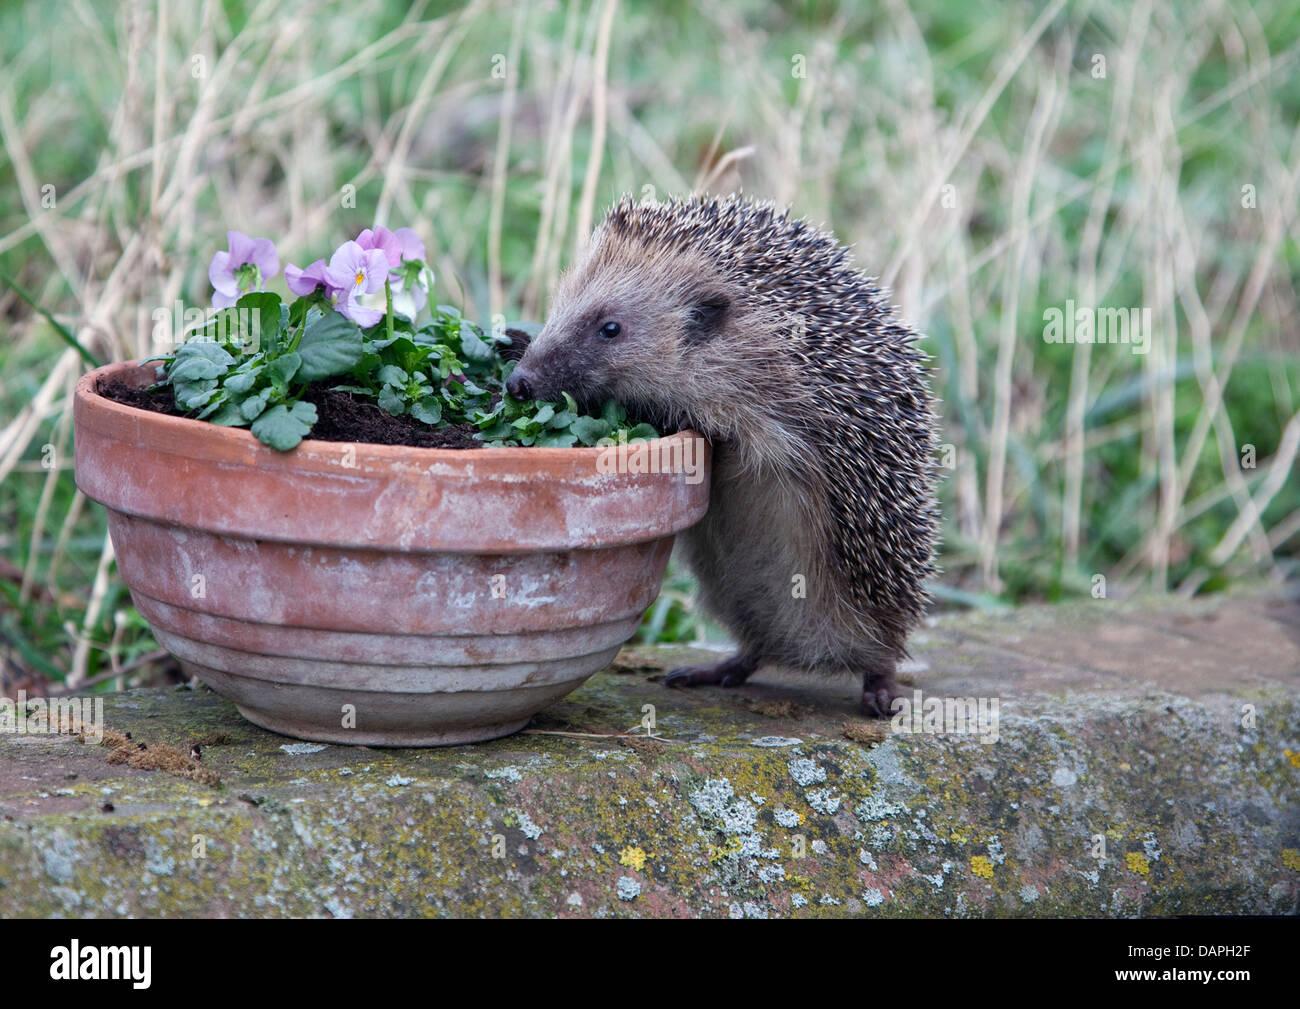 European hedgehog climbing plant pot - Stock Image